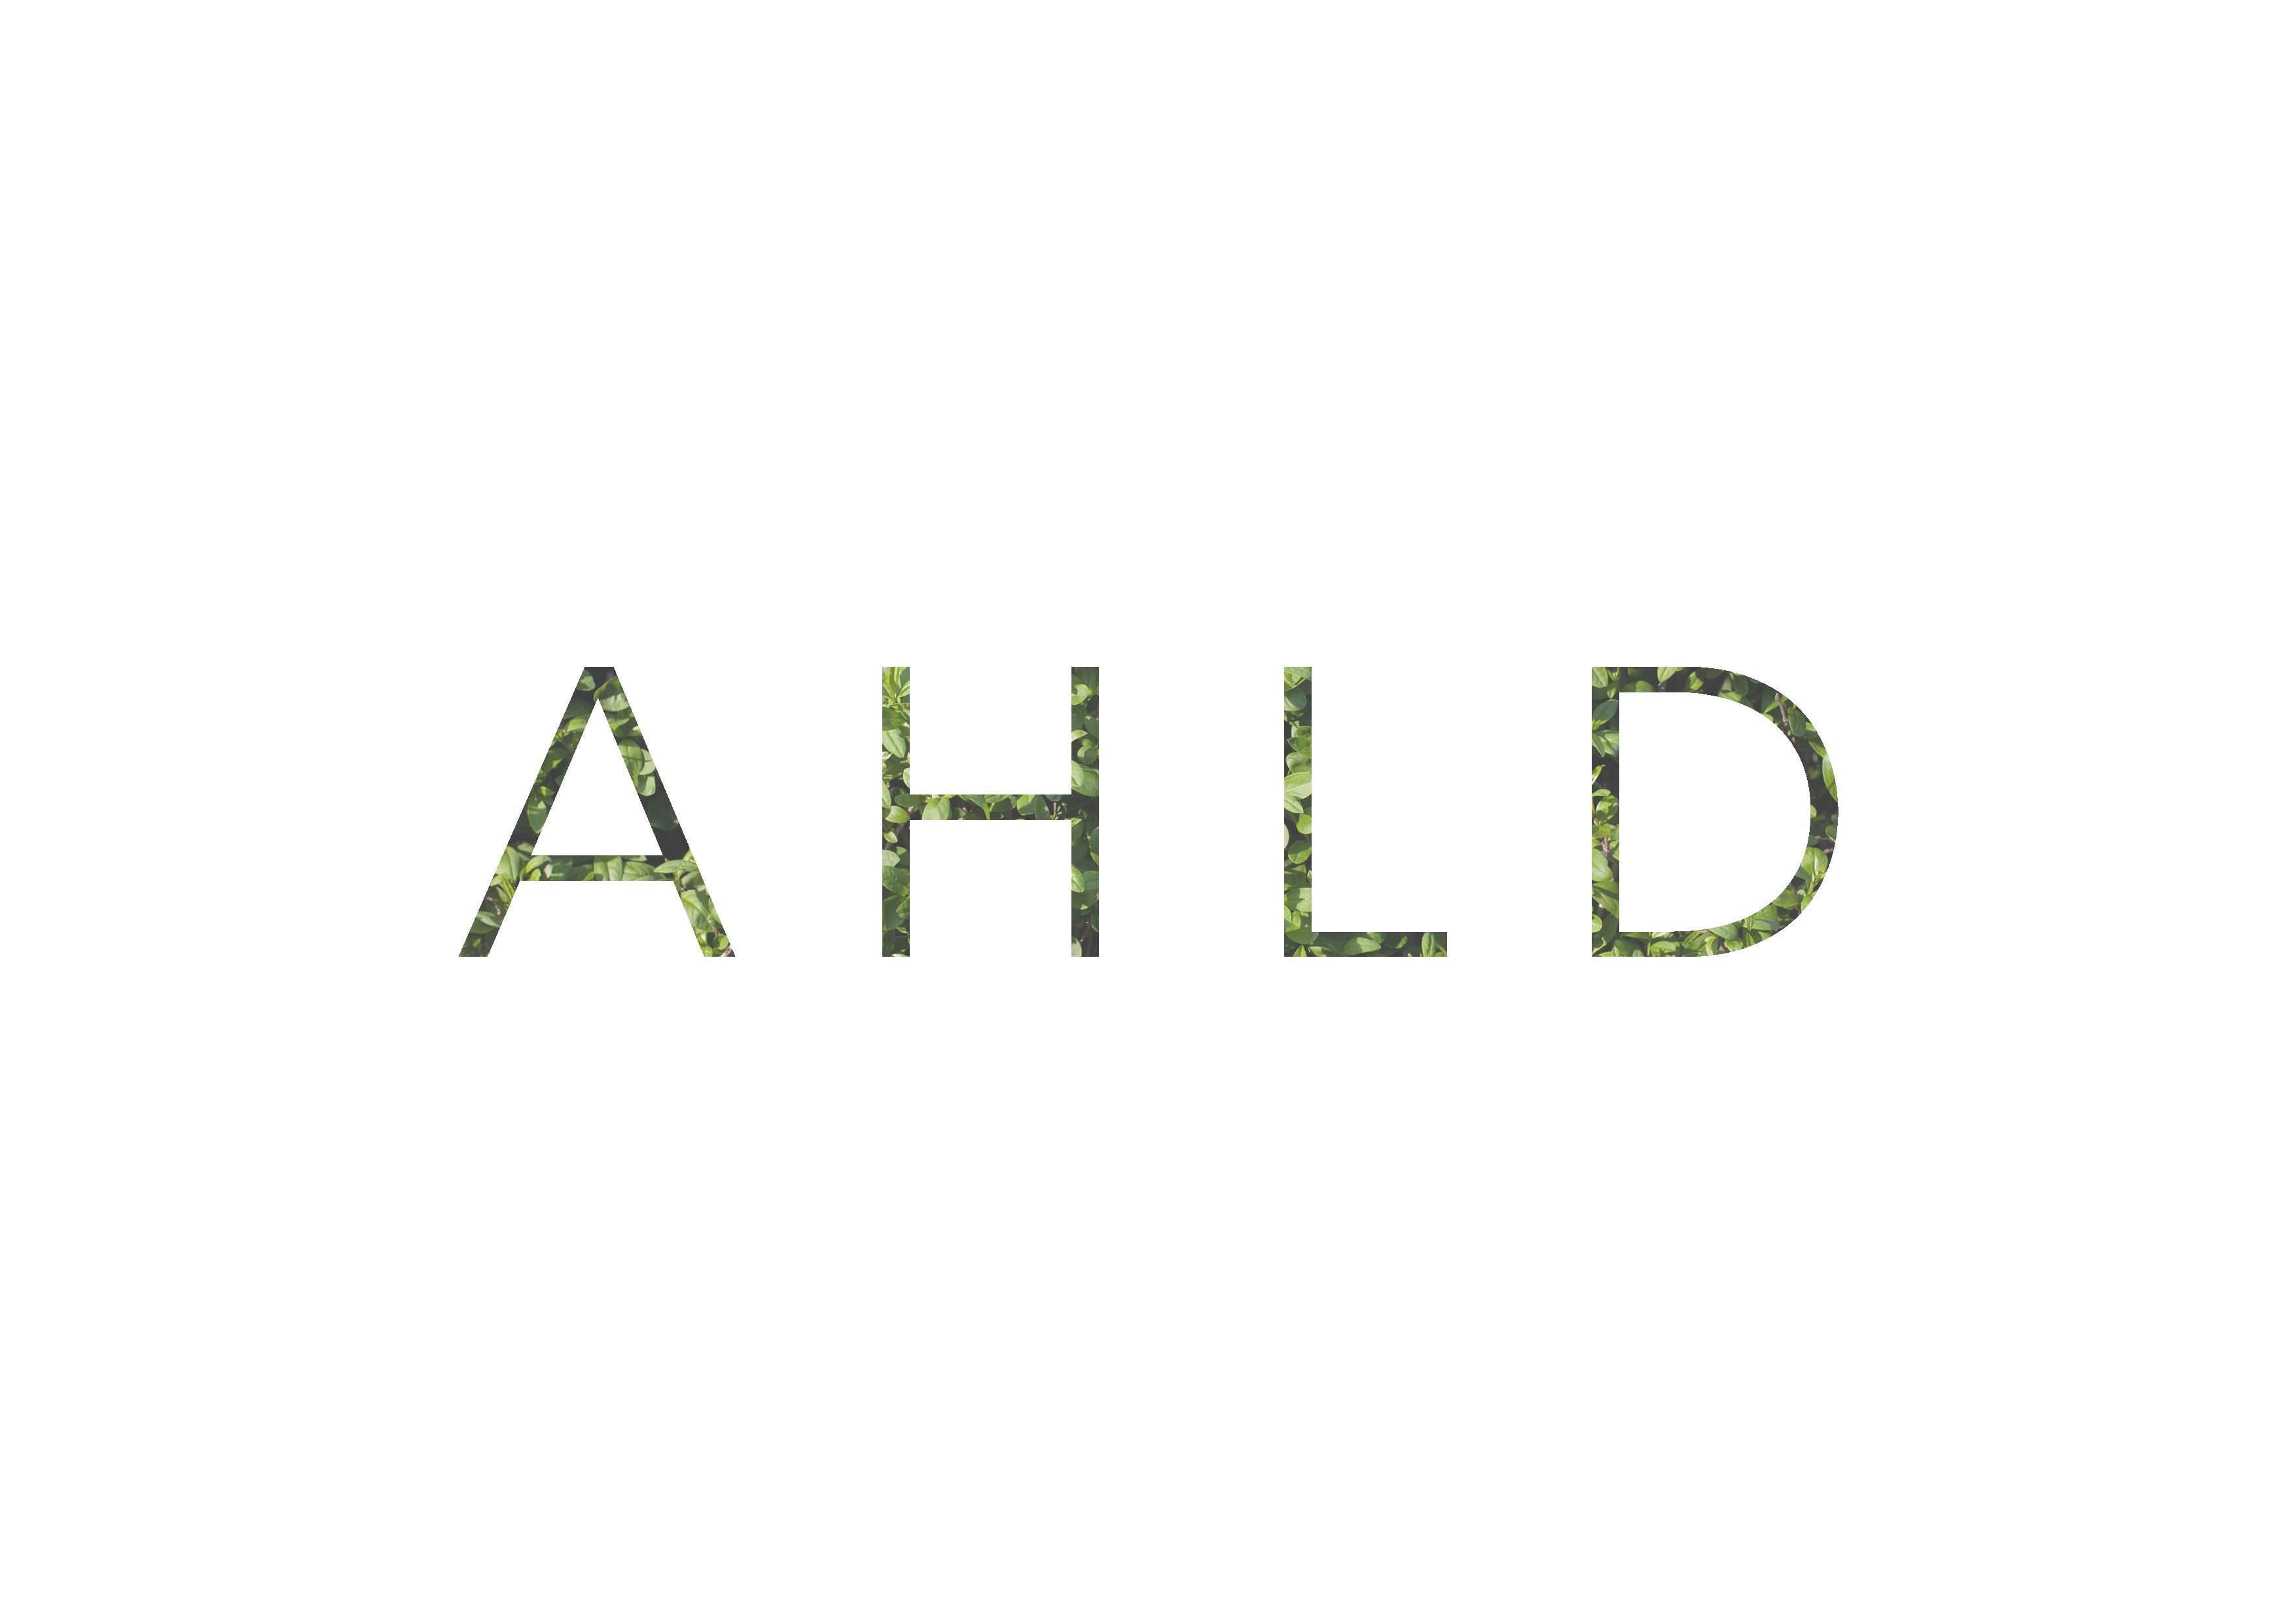 Aaron Holman Landscape Design